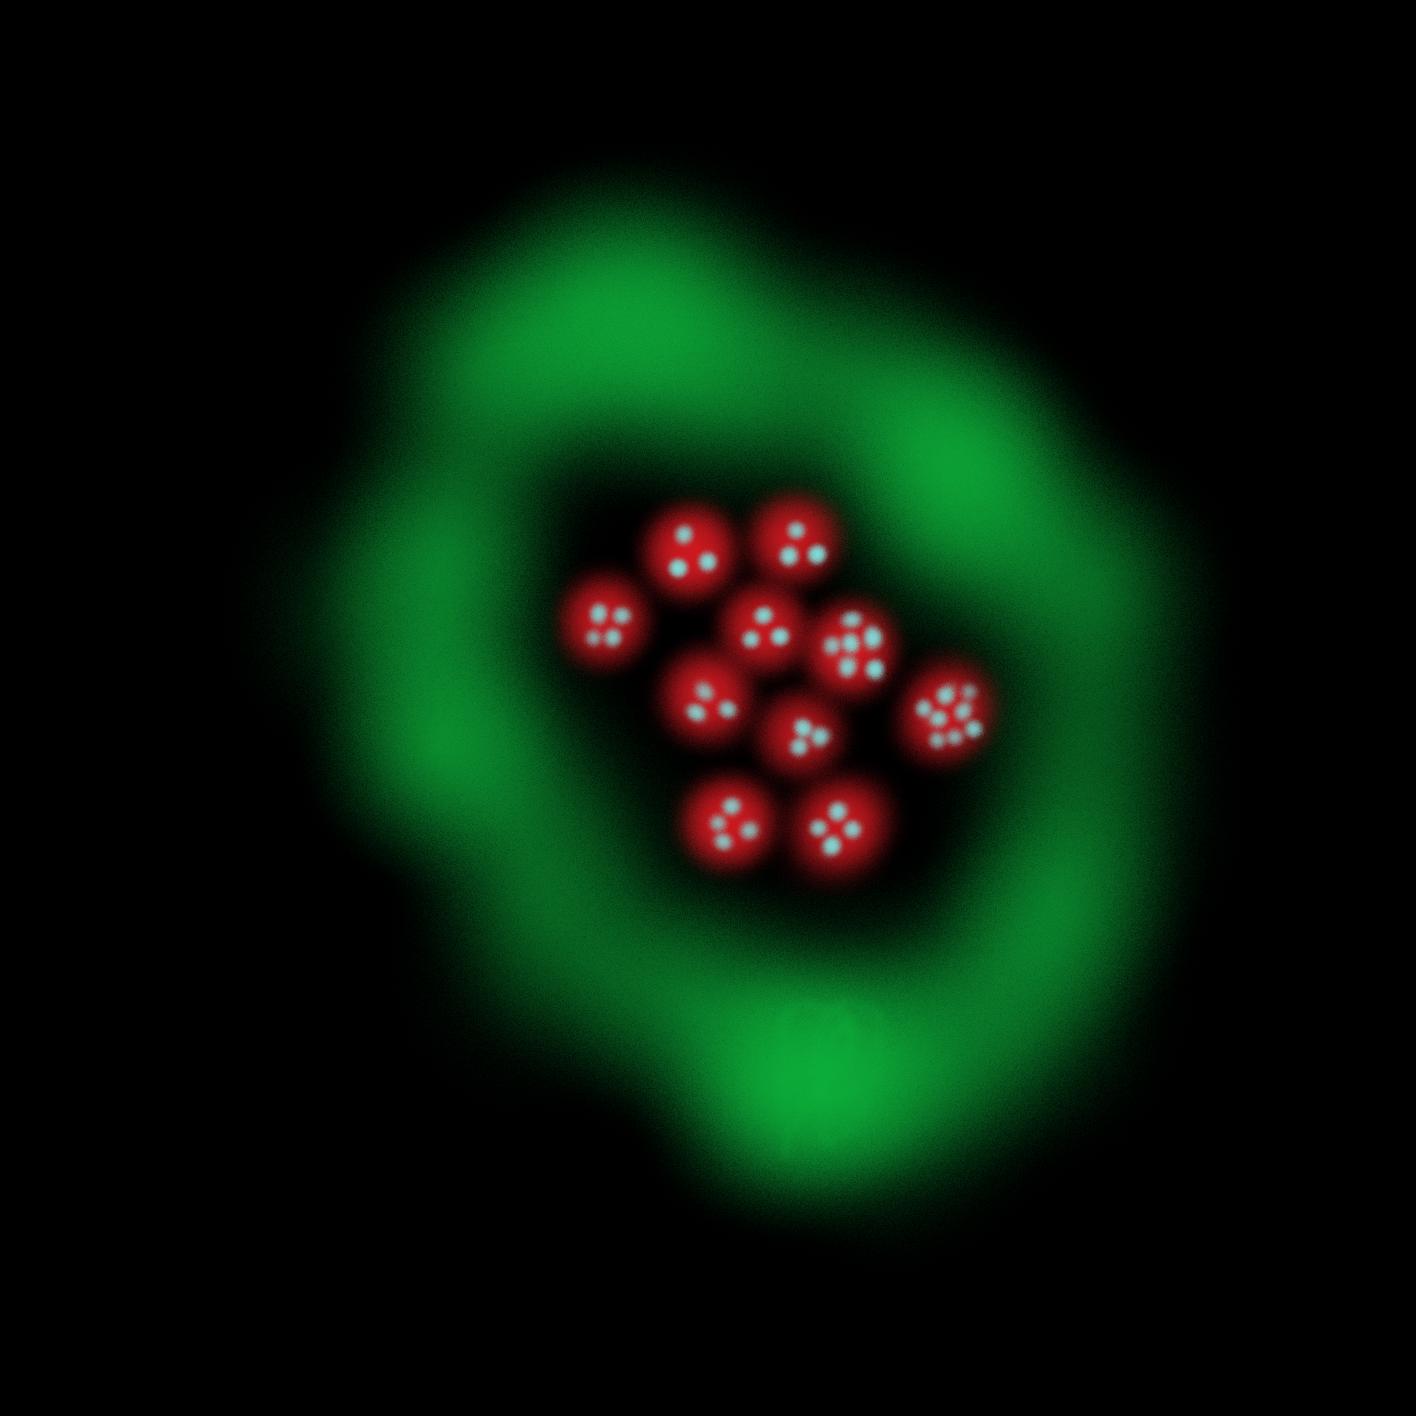 Green Ring